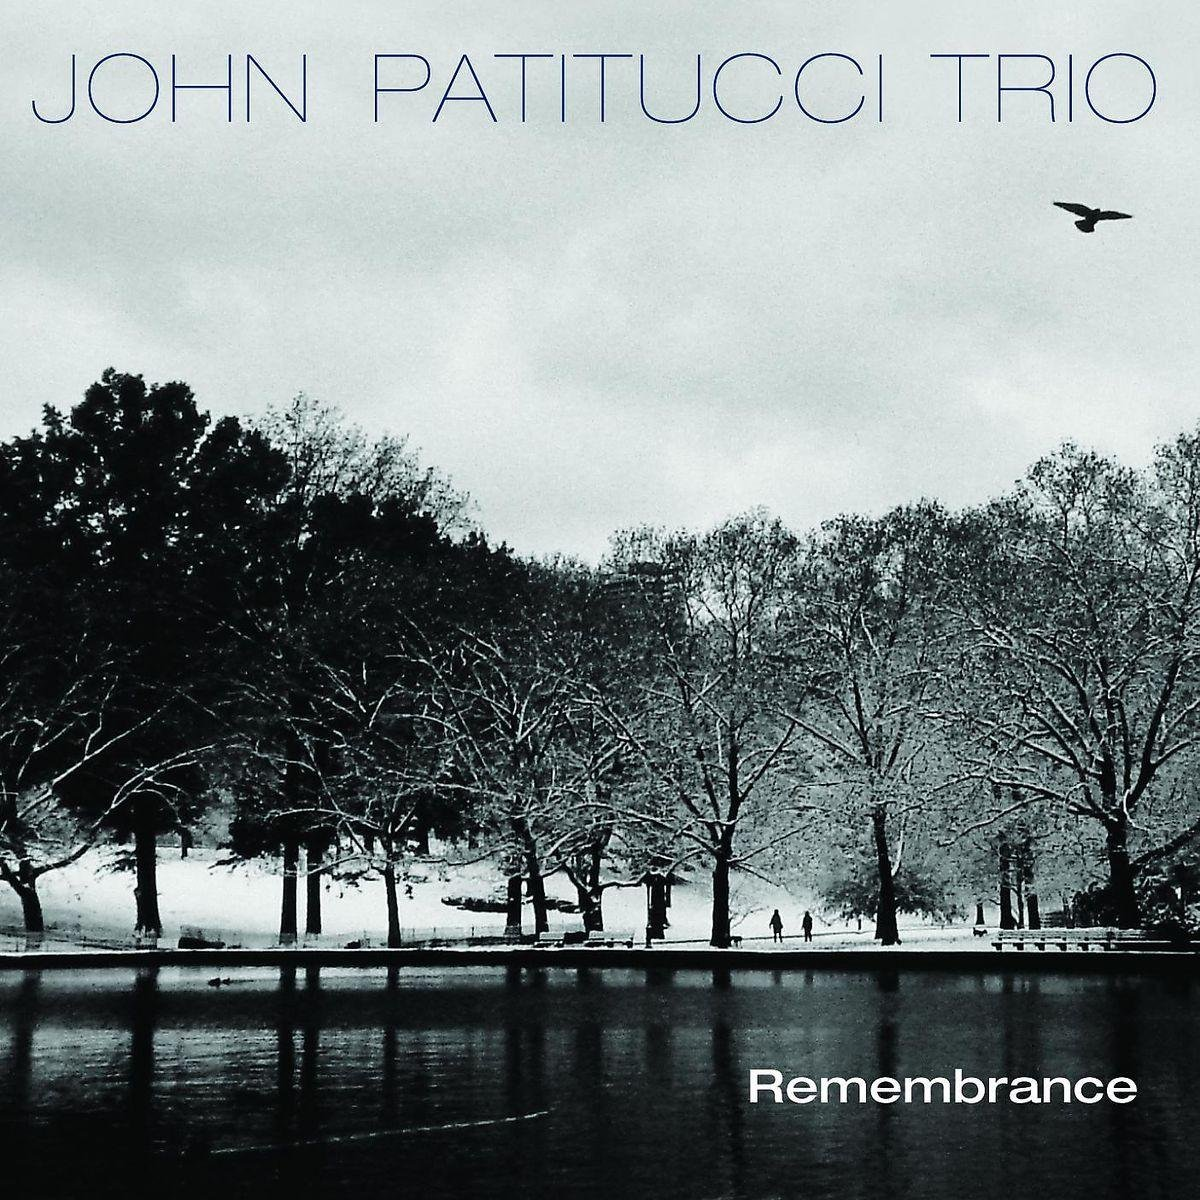 john patitucci remembrance